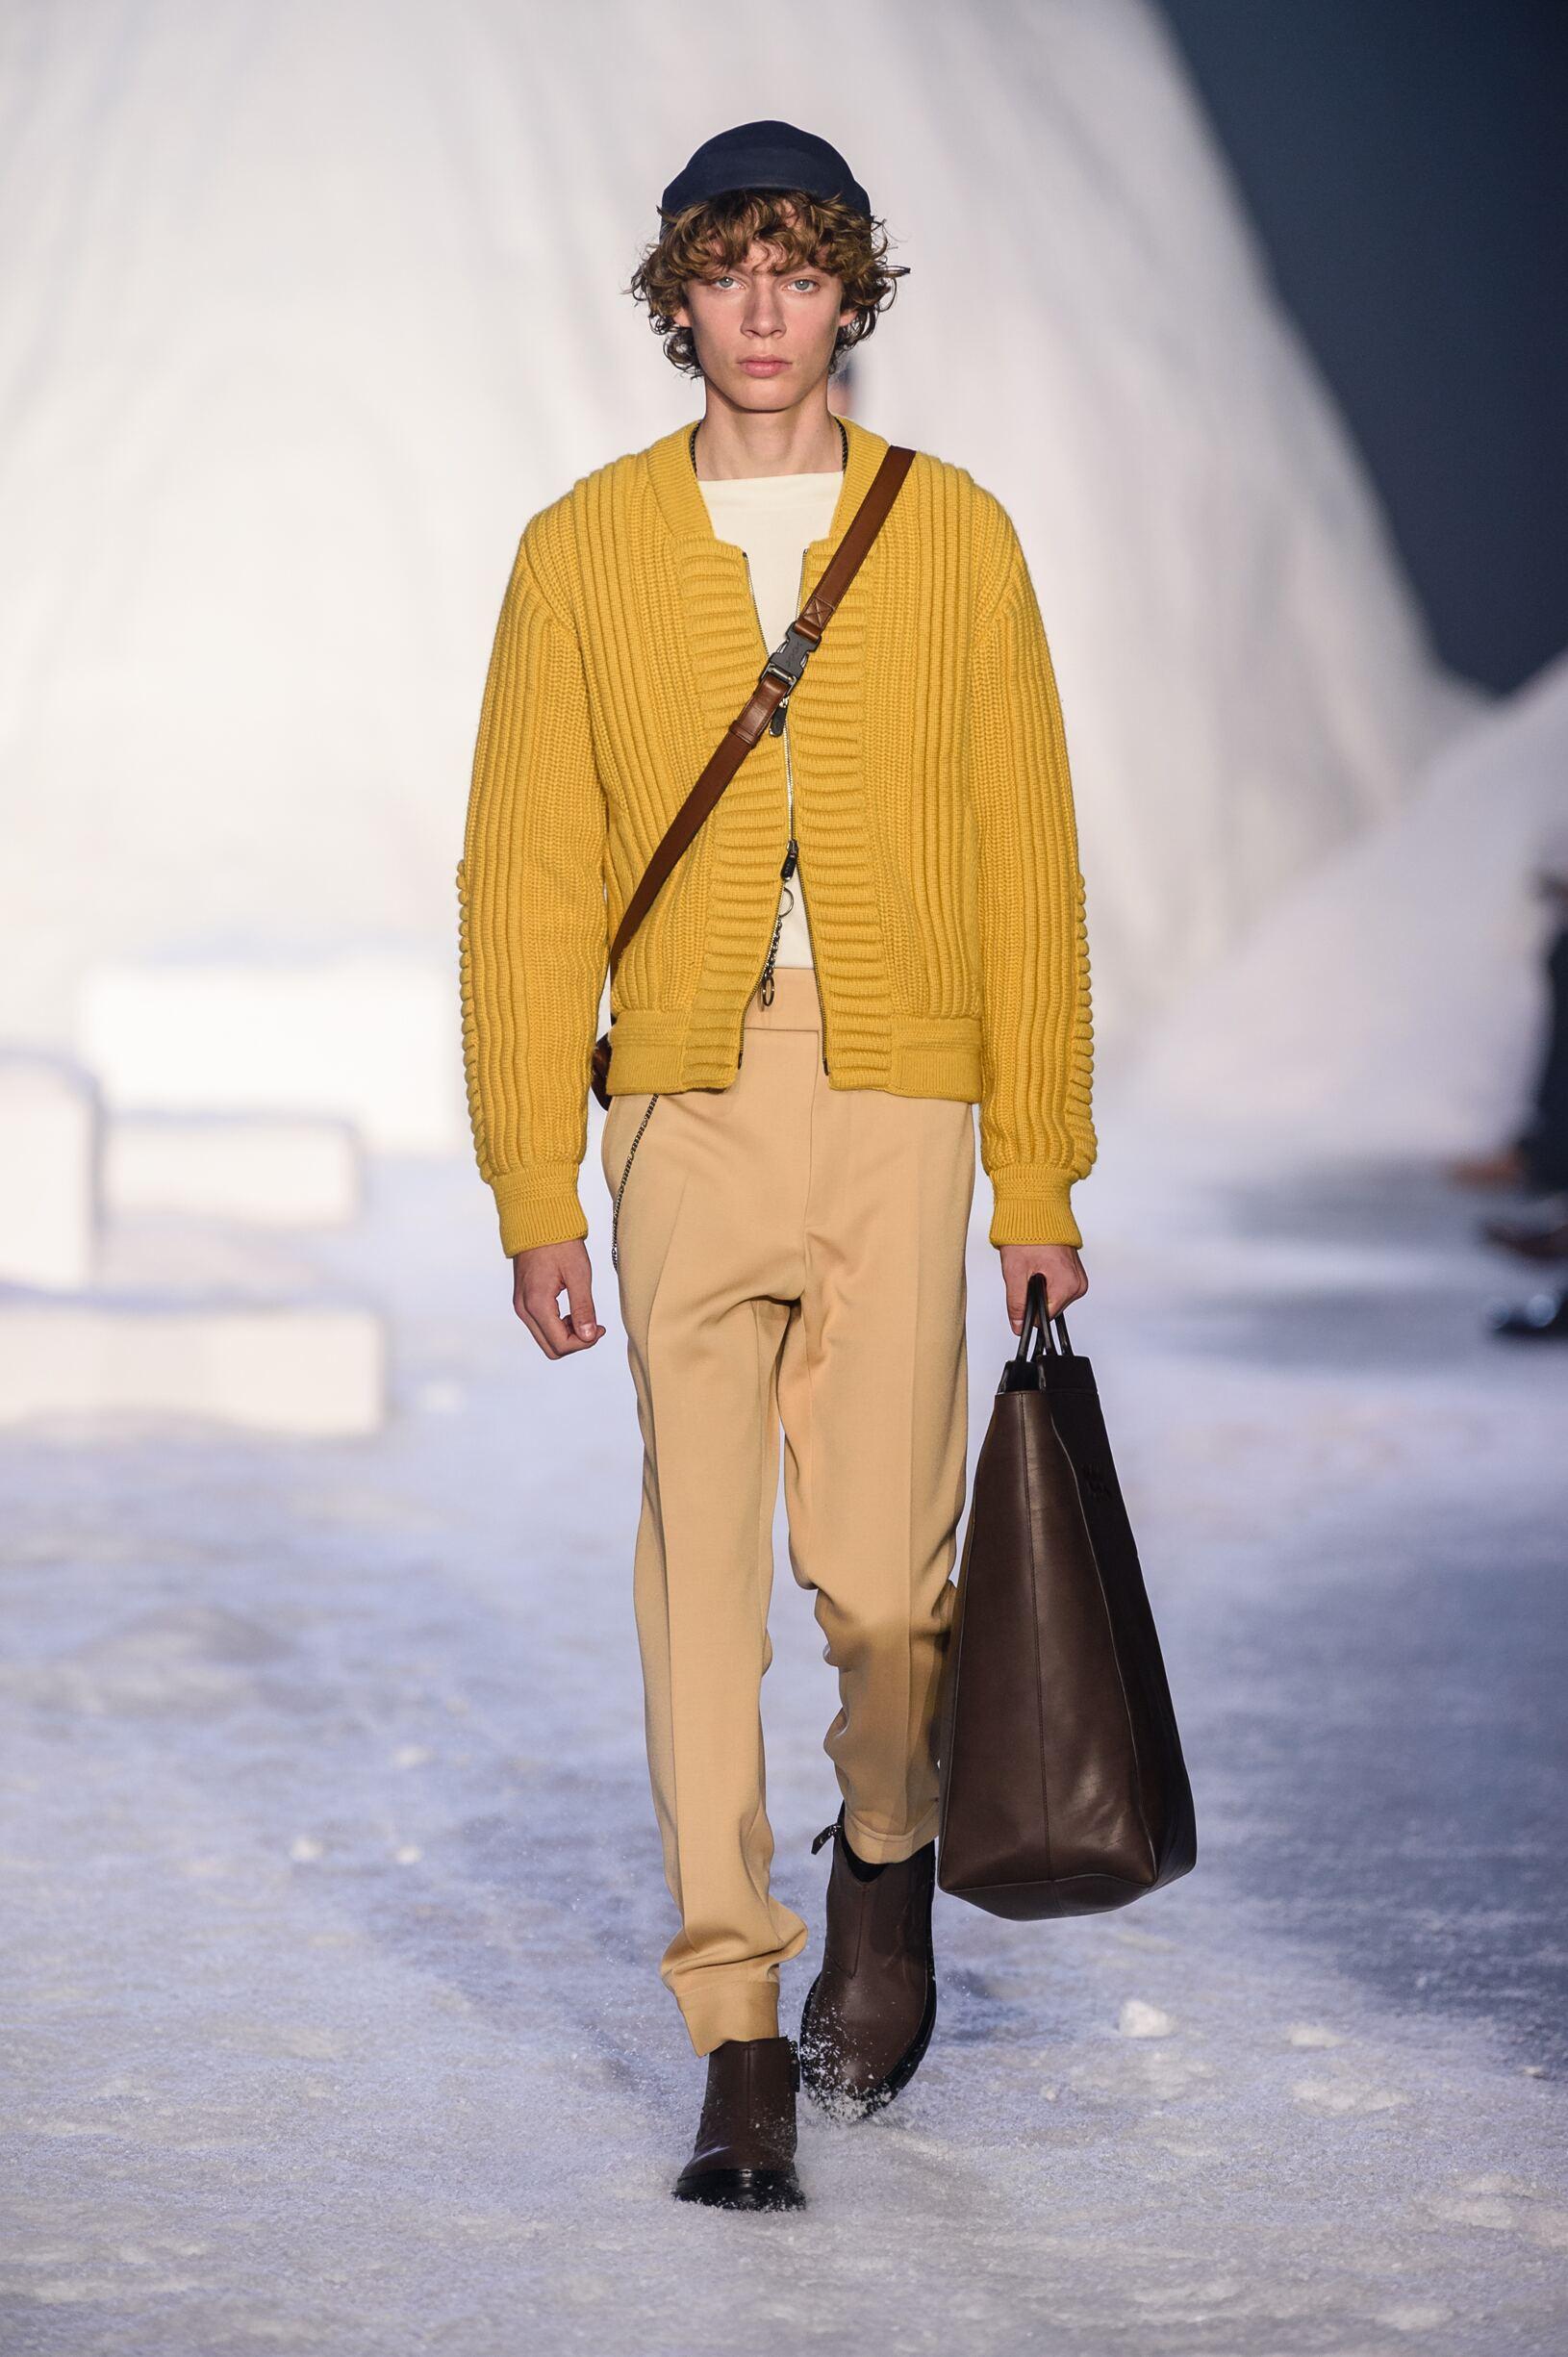 Runway Ermenegildo Zegna Couture Fall Winter 2018 Men's Collection Milan Fashion Week